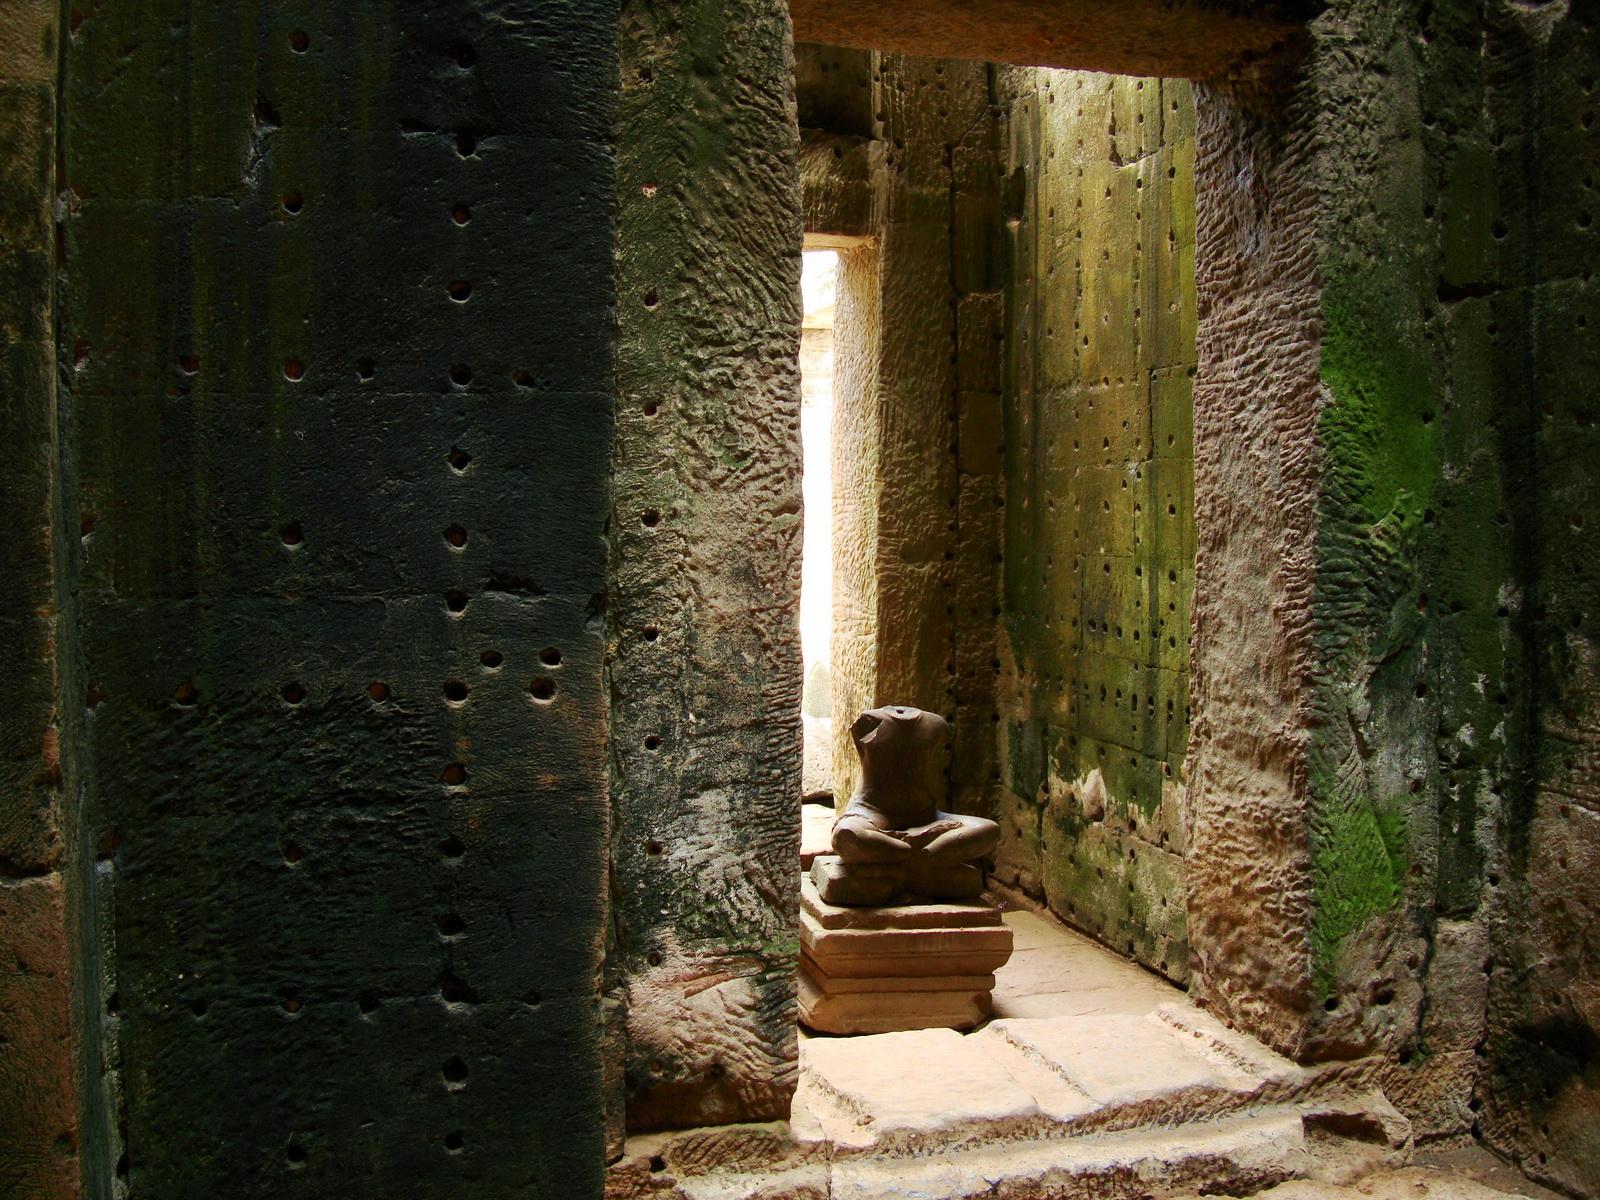 Preah Khan sanctuary headless Buddha Preah Vihear province 03